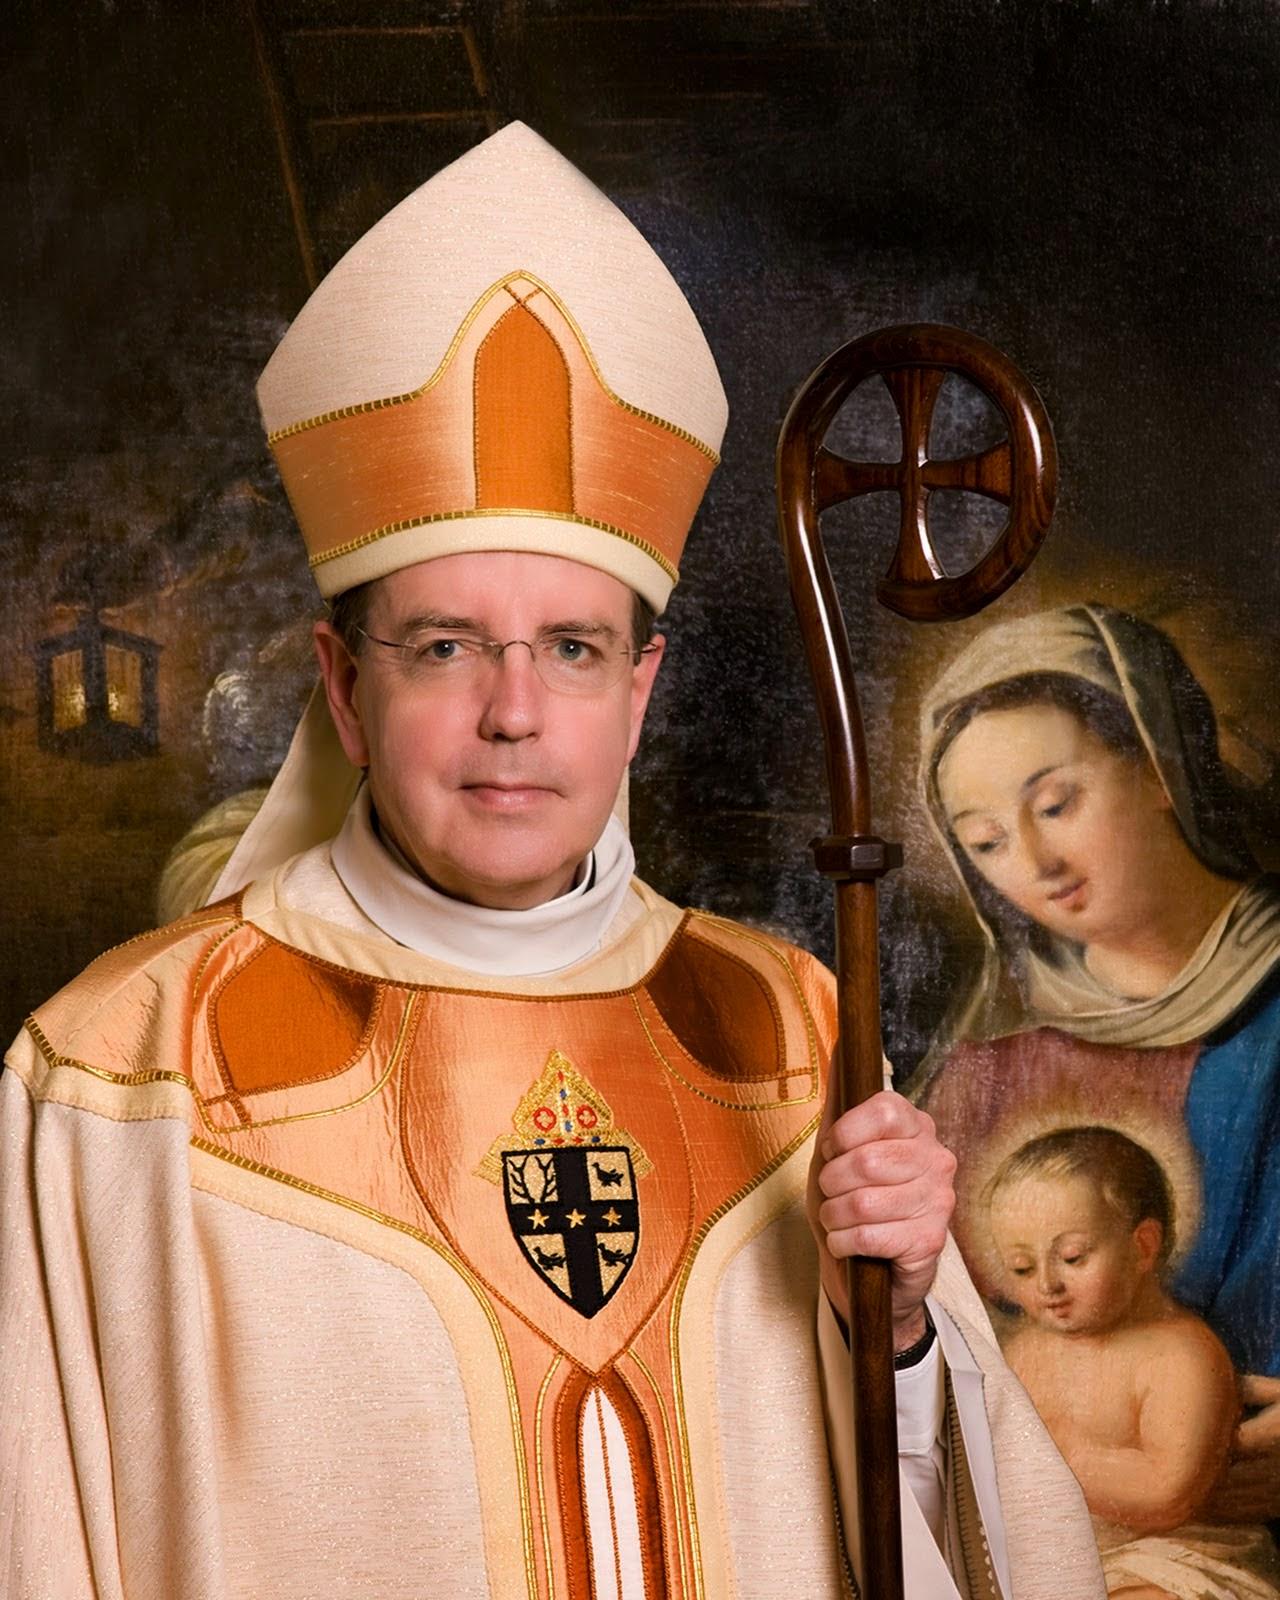 Archbishop Vigneron prohibits speaker who promotes 'gay' agenda